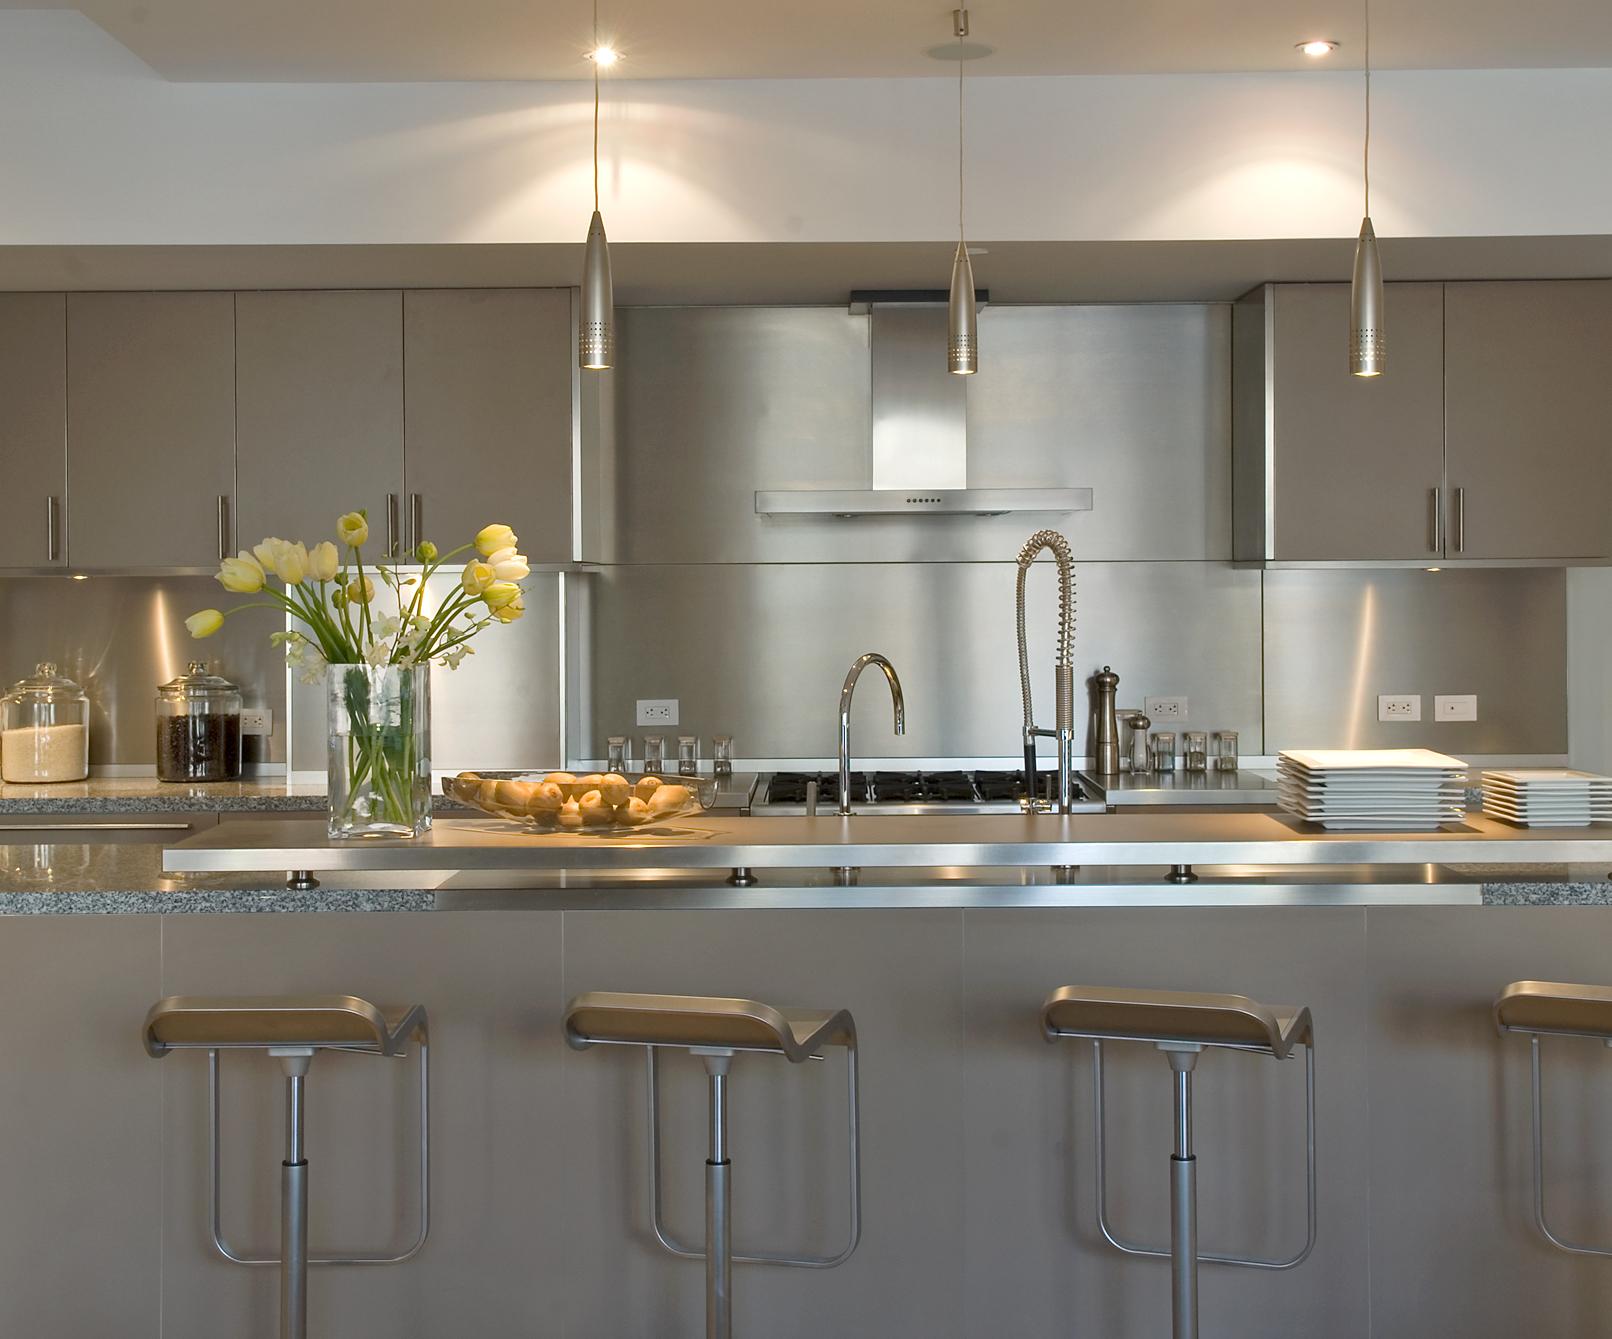 Architecture and Interior Design Firm 38Spatial Inc Recognized for Contemporary Portfolio